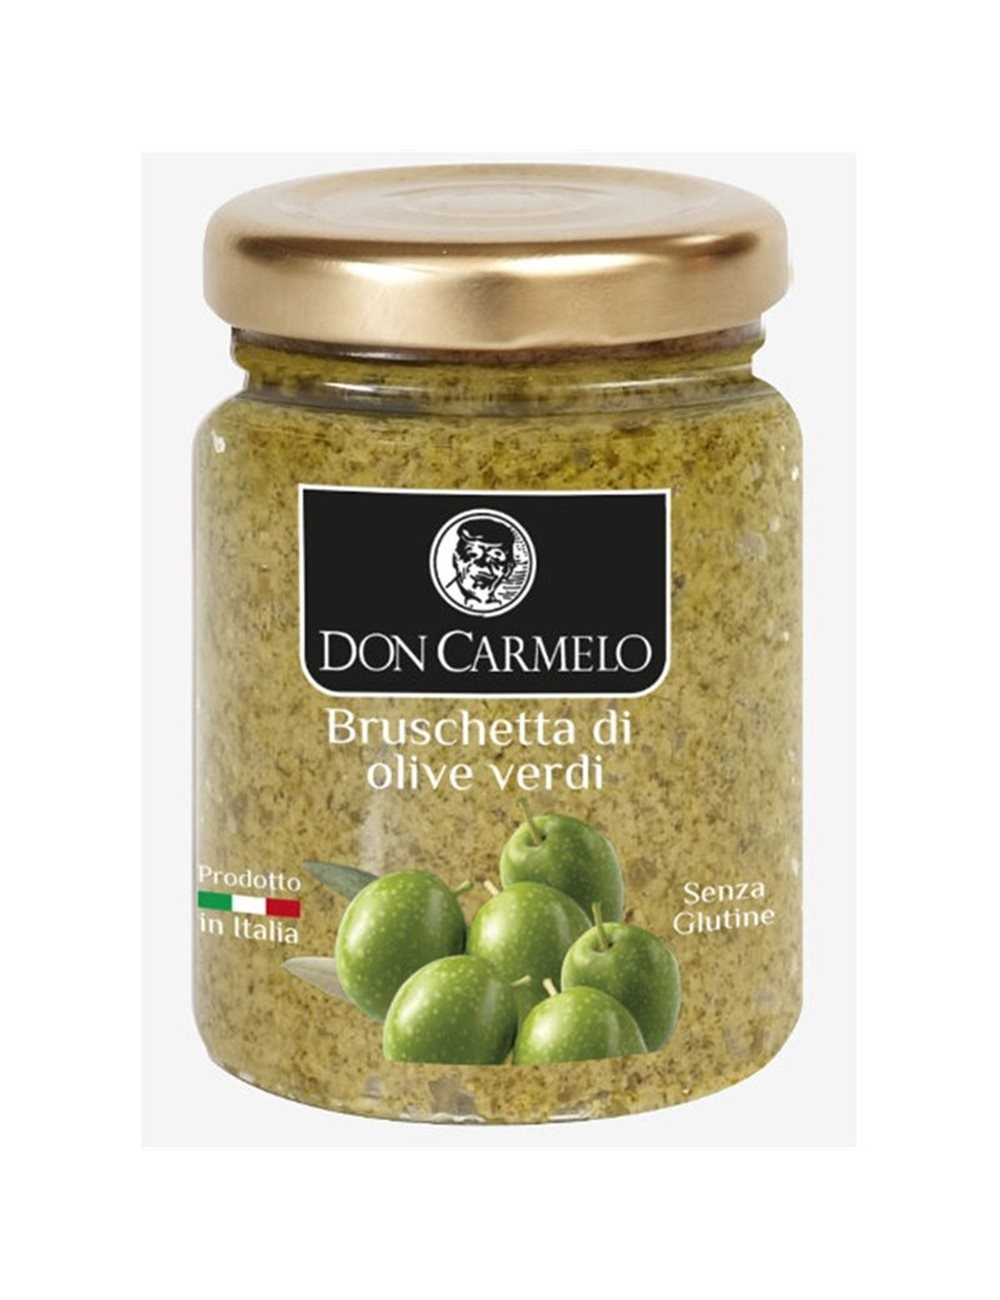 Don Carmelo Bruschetta di Olive Verdi 100gr